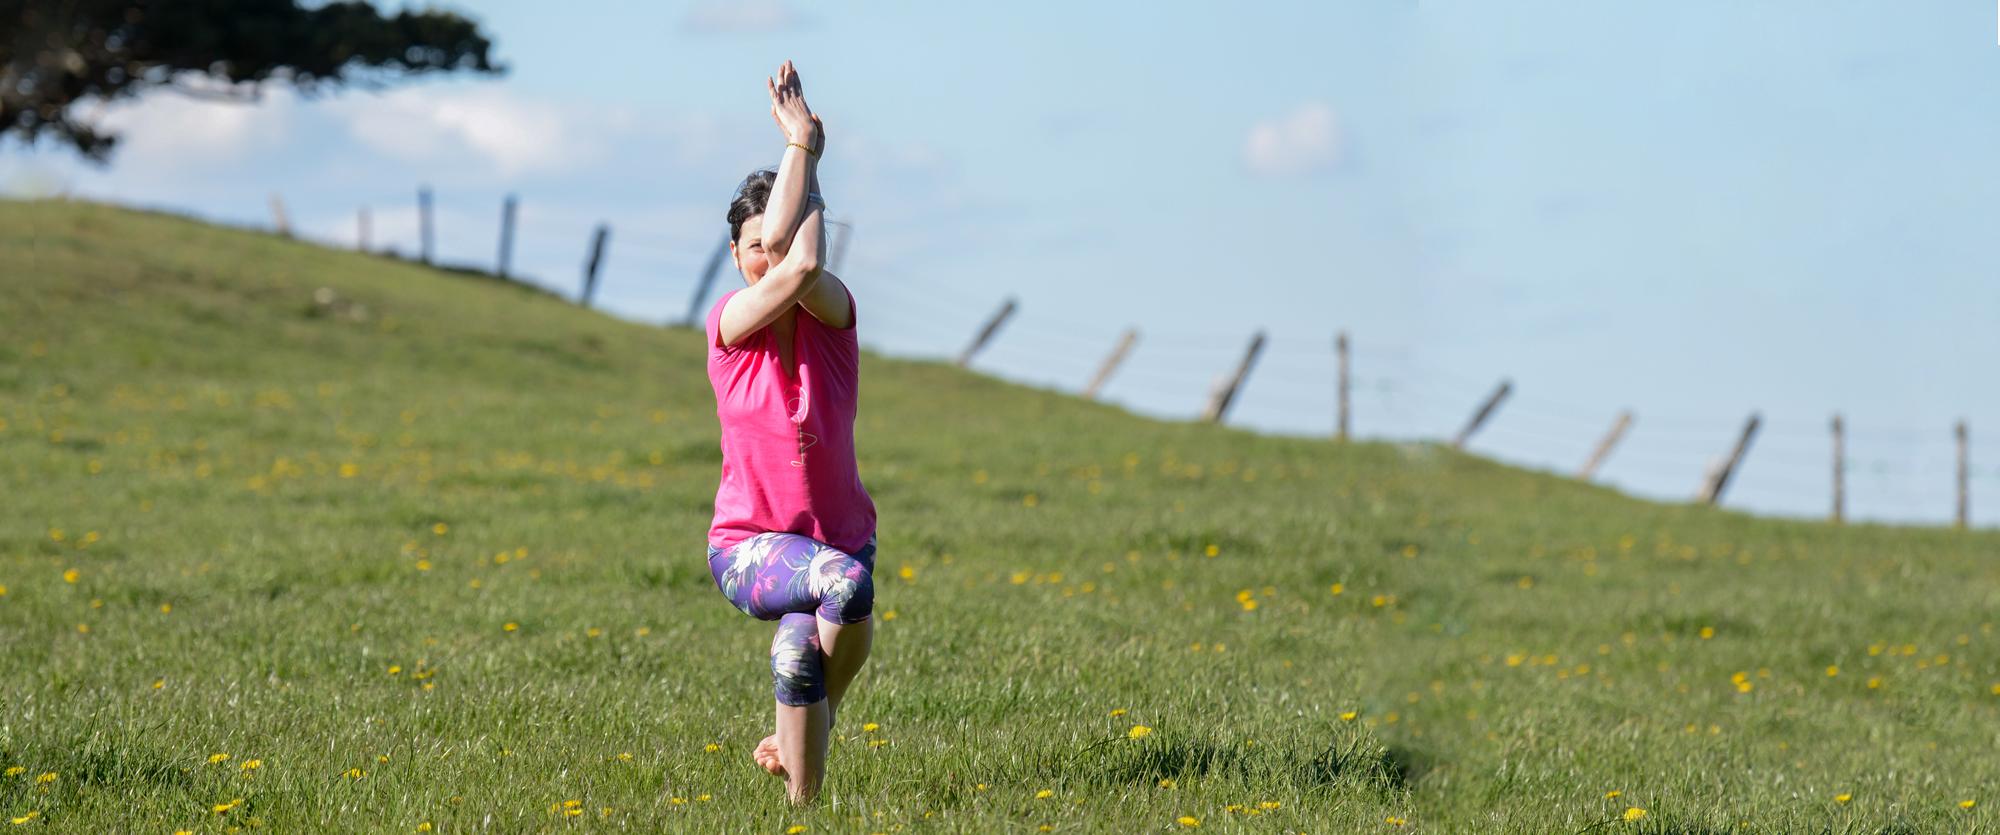 posture-viva-yoga-slider3.png